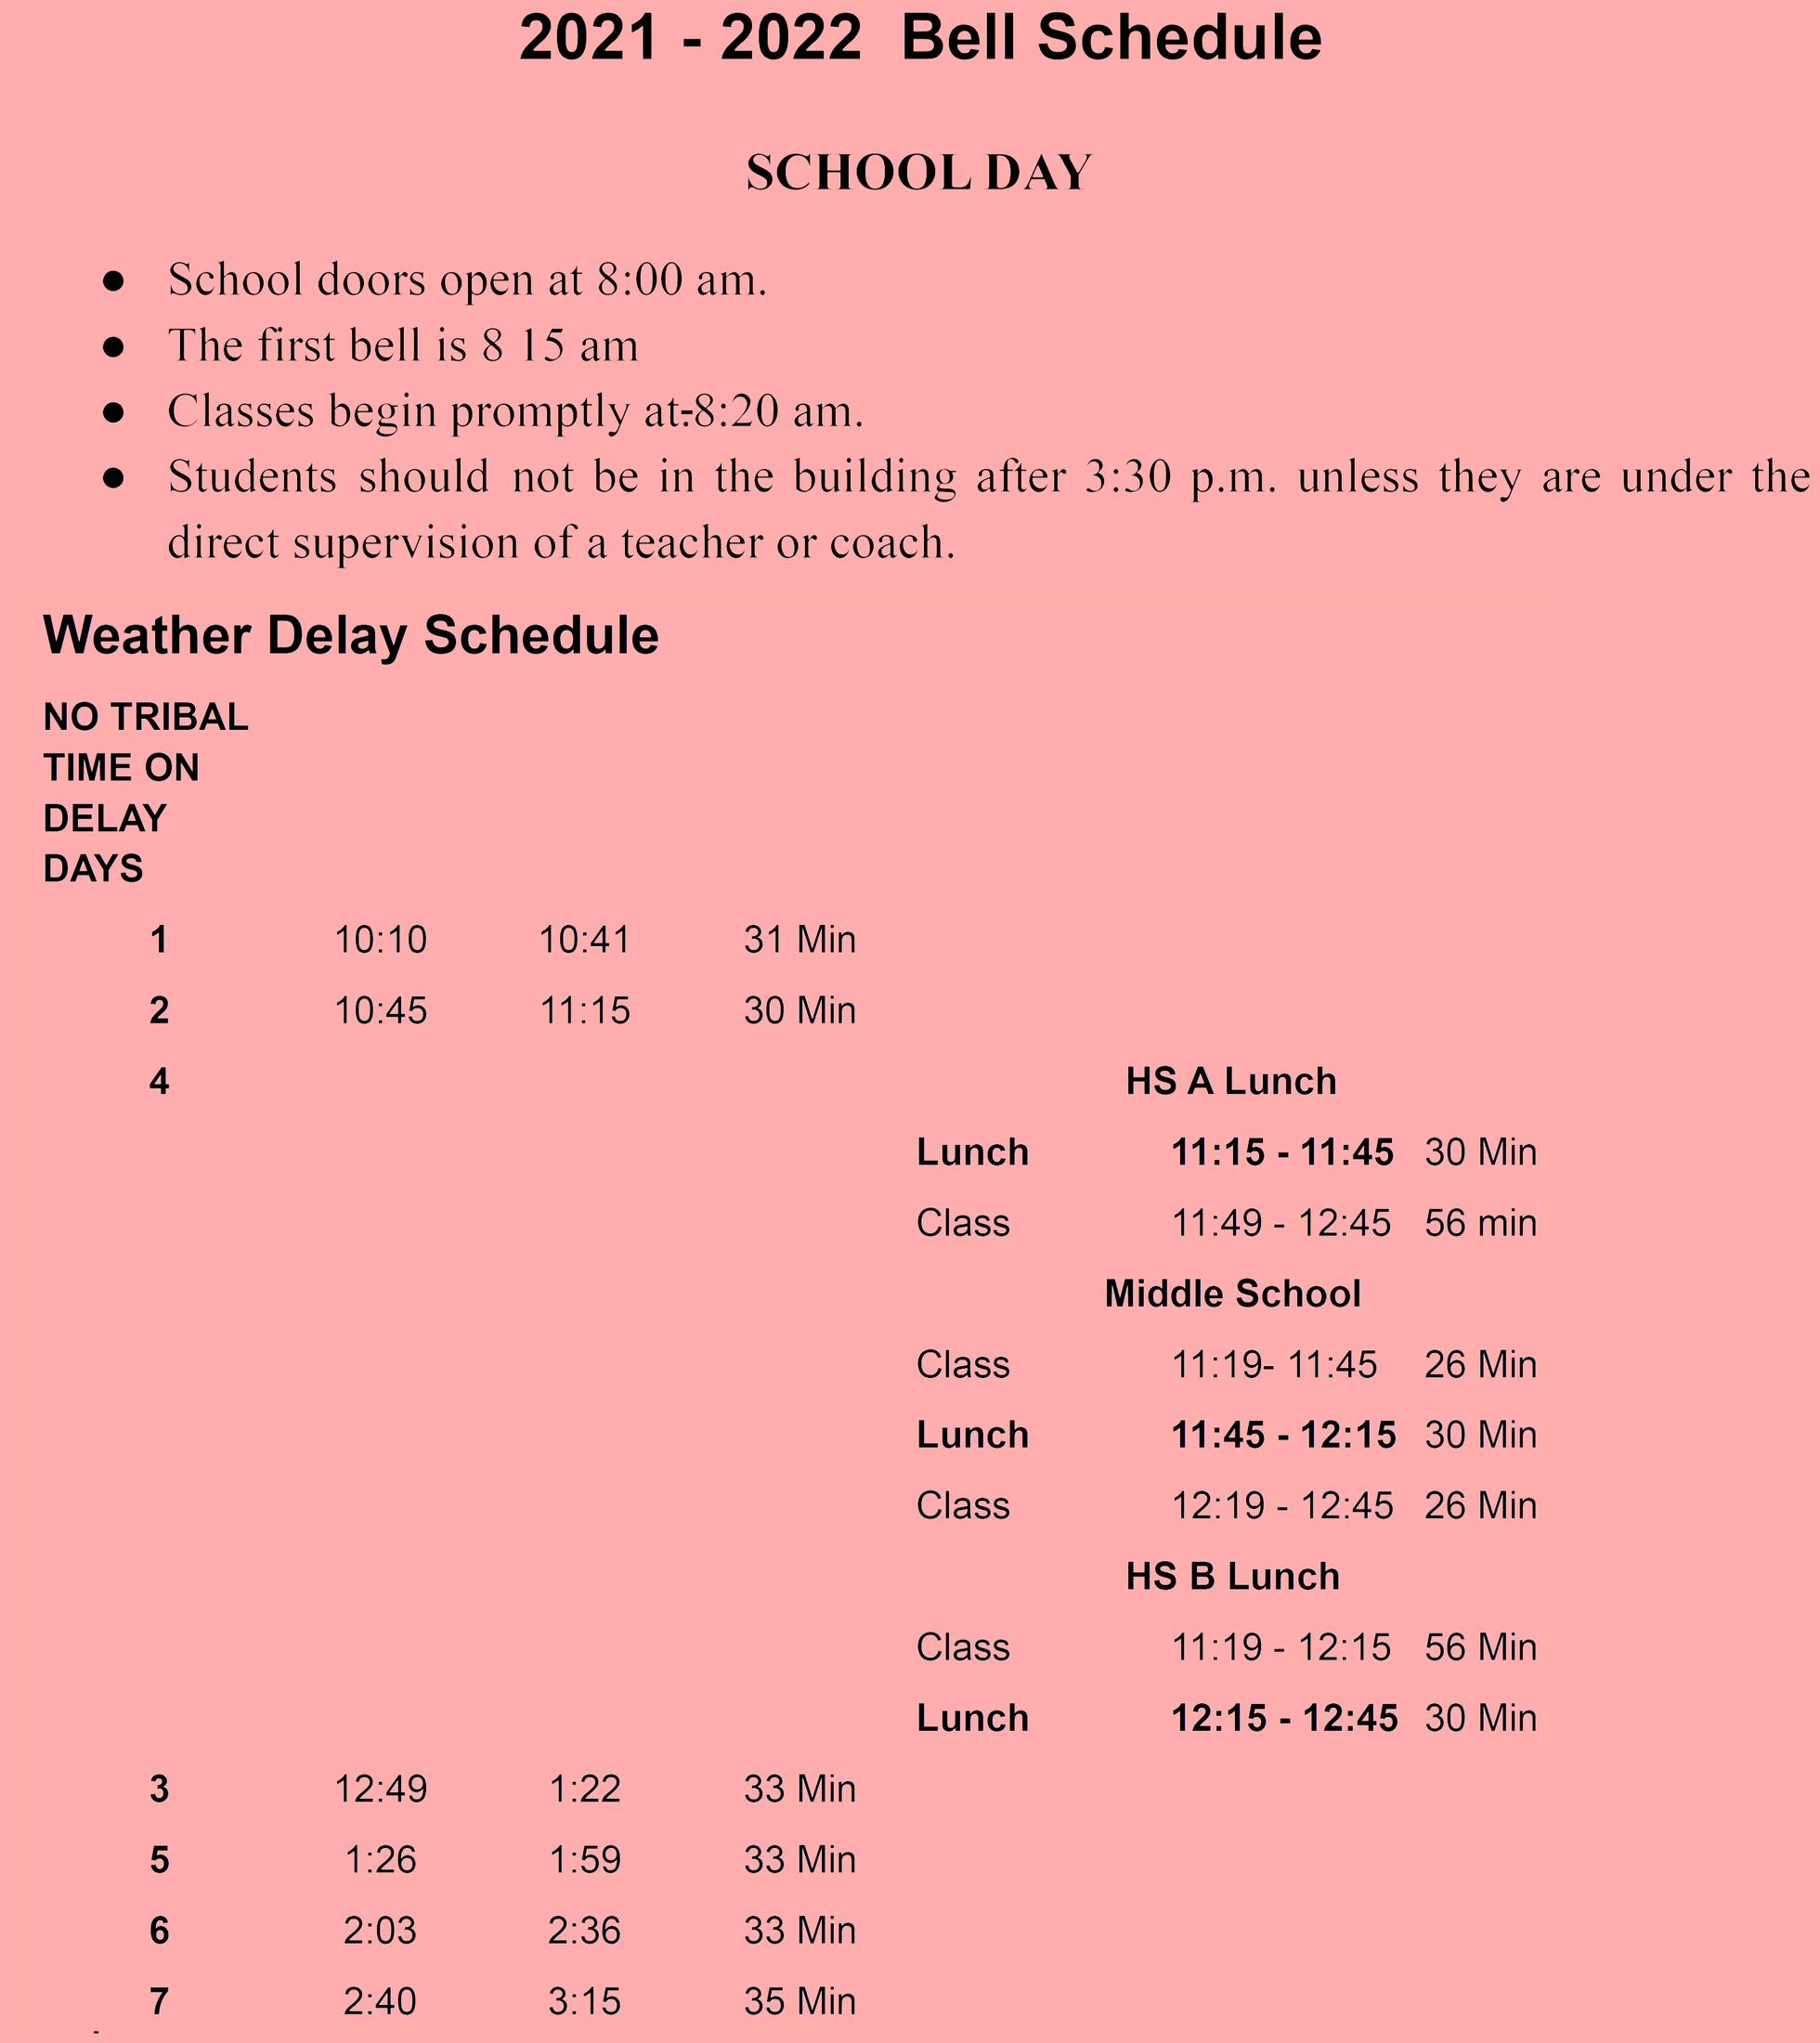 UCJSHS Weather Delay Bell Schedule